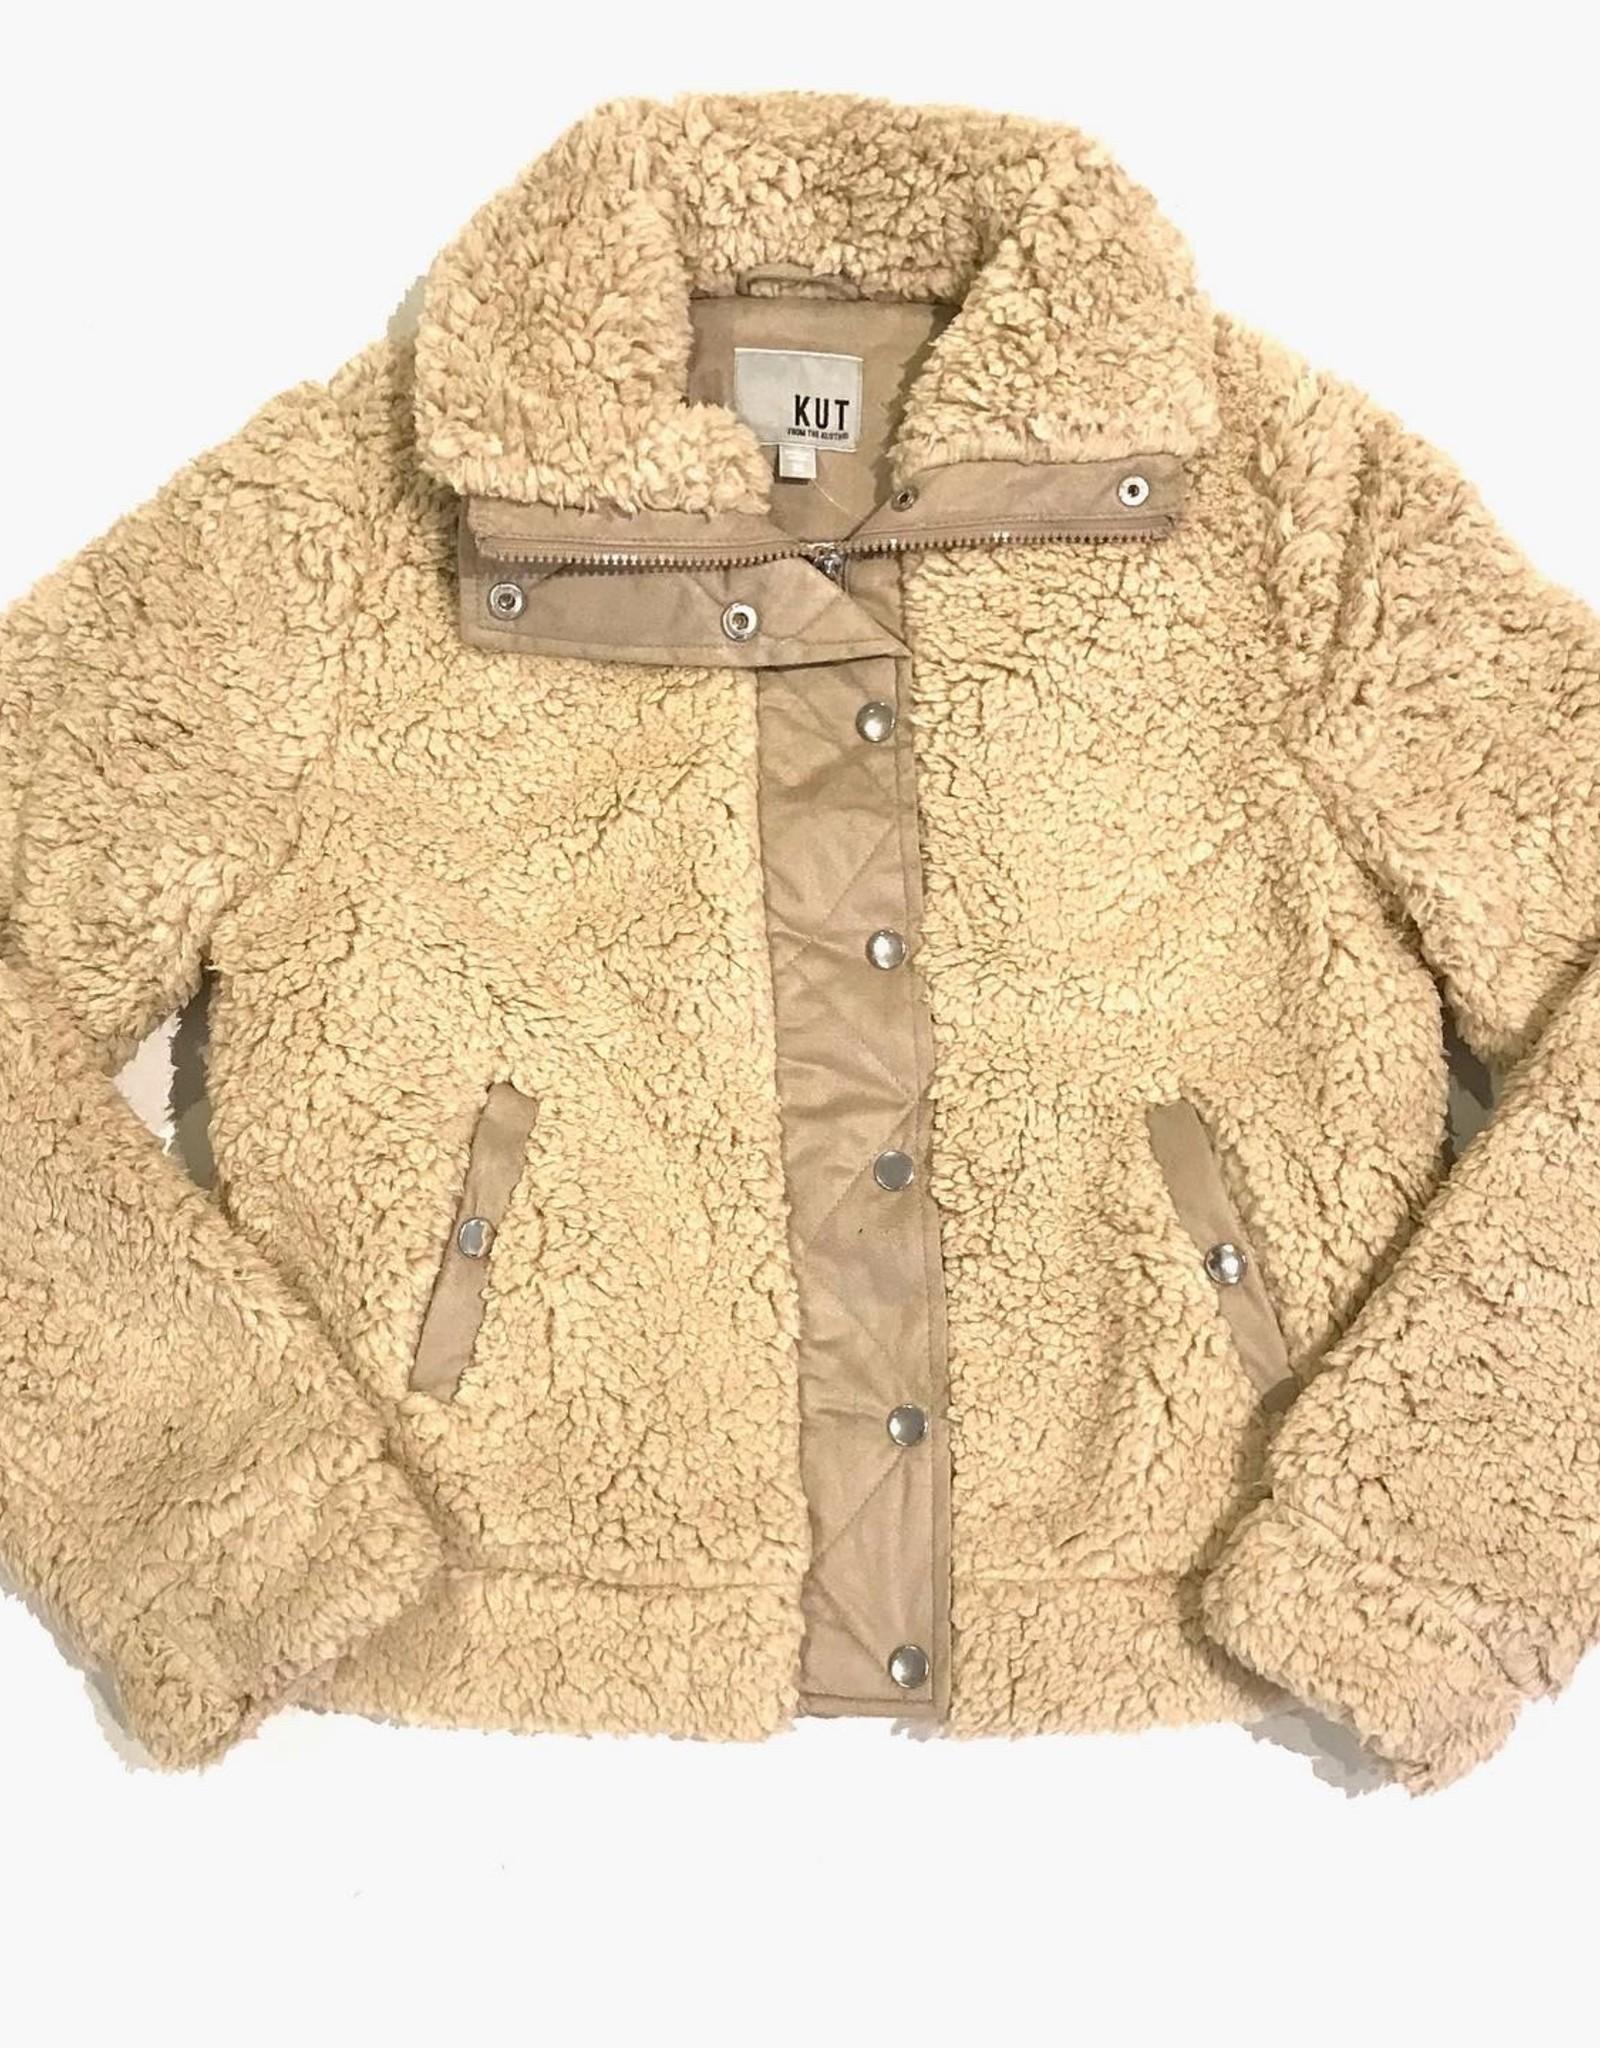 Kut Zip front fuzzy jacket KJ46301